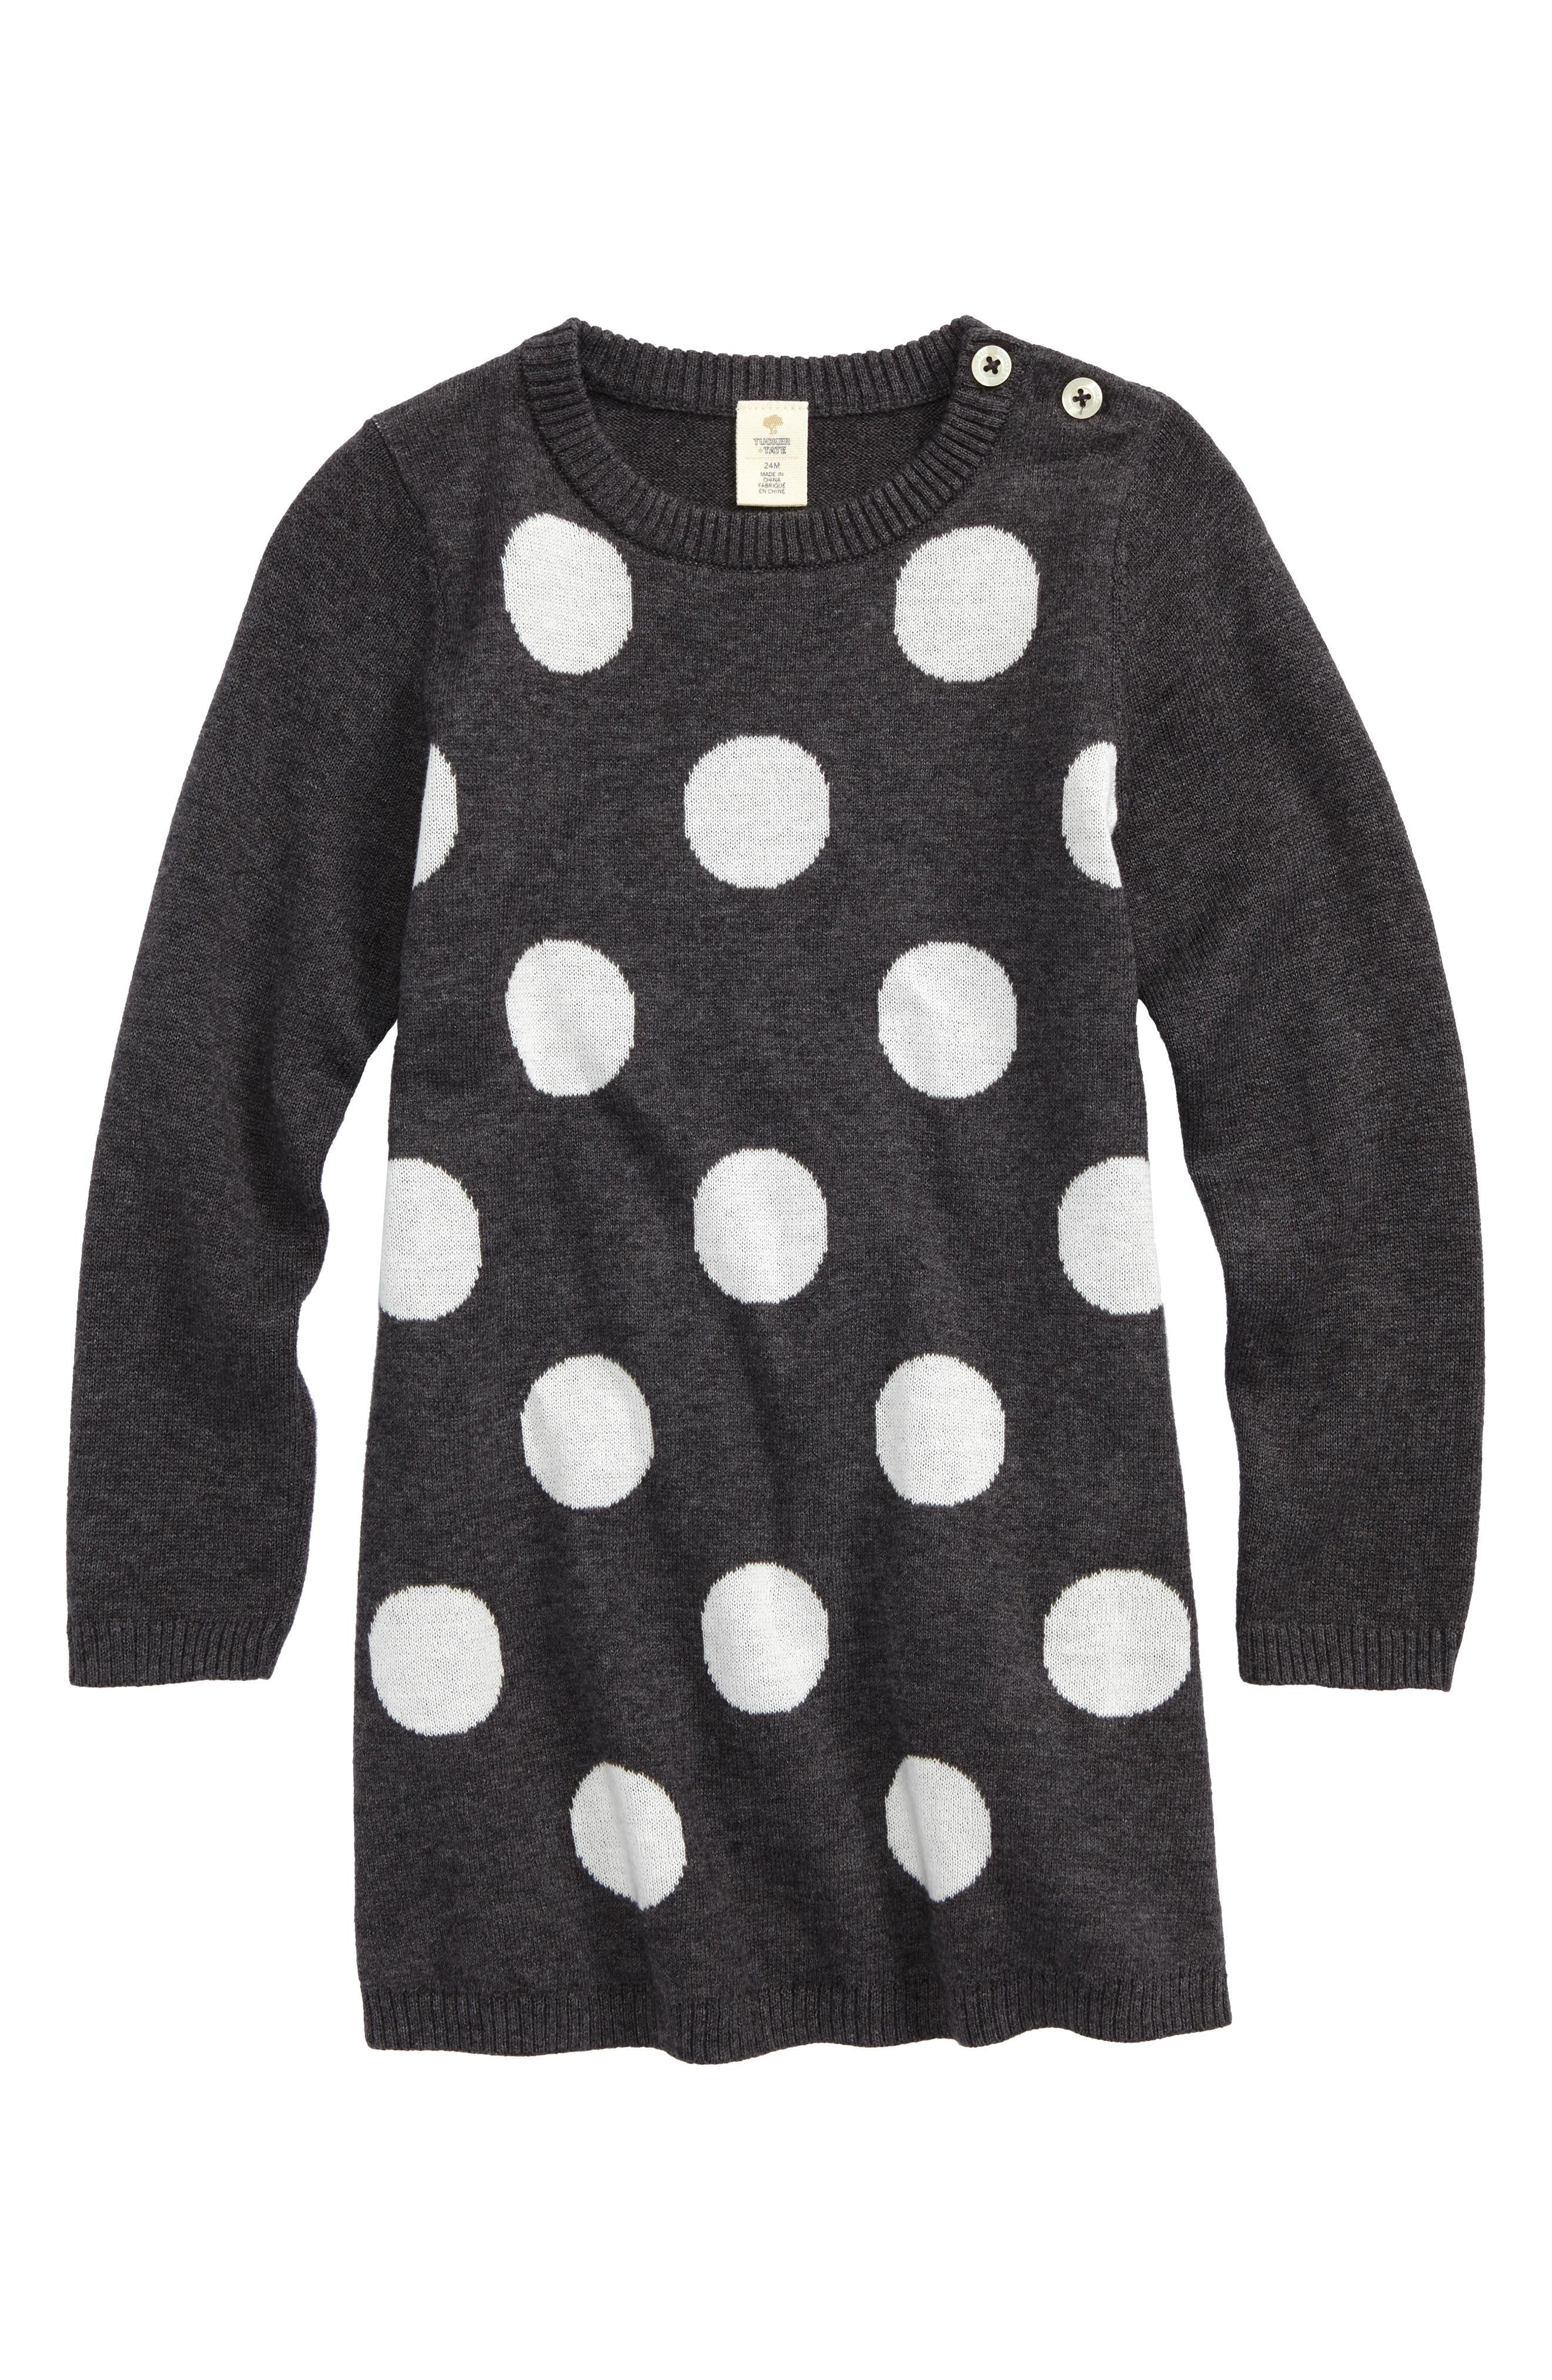 Main Image - Tucker + Tate Polka Dot Sweater Dress (Baby Girls)